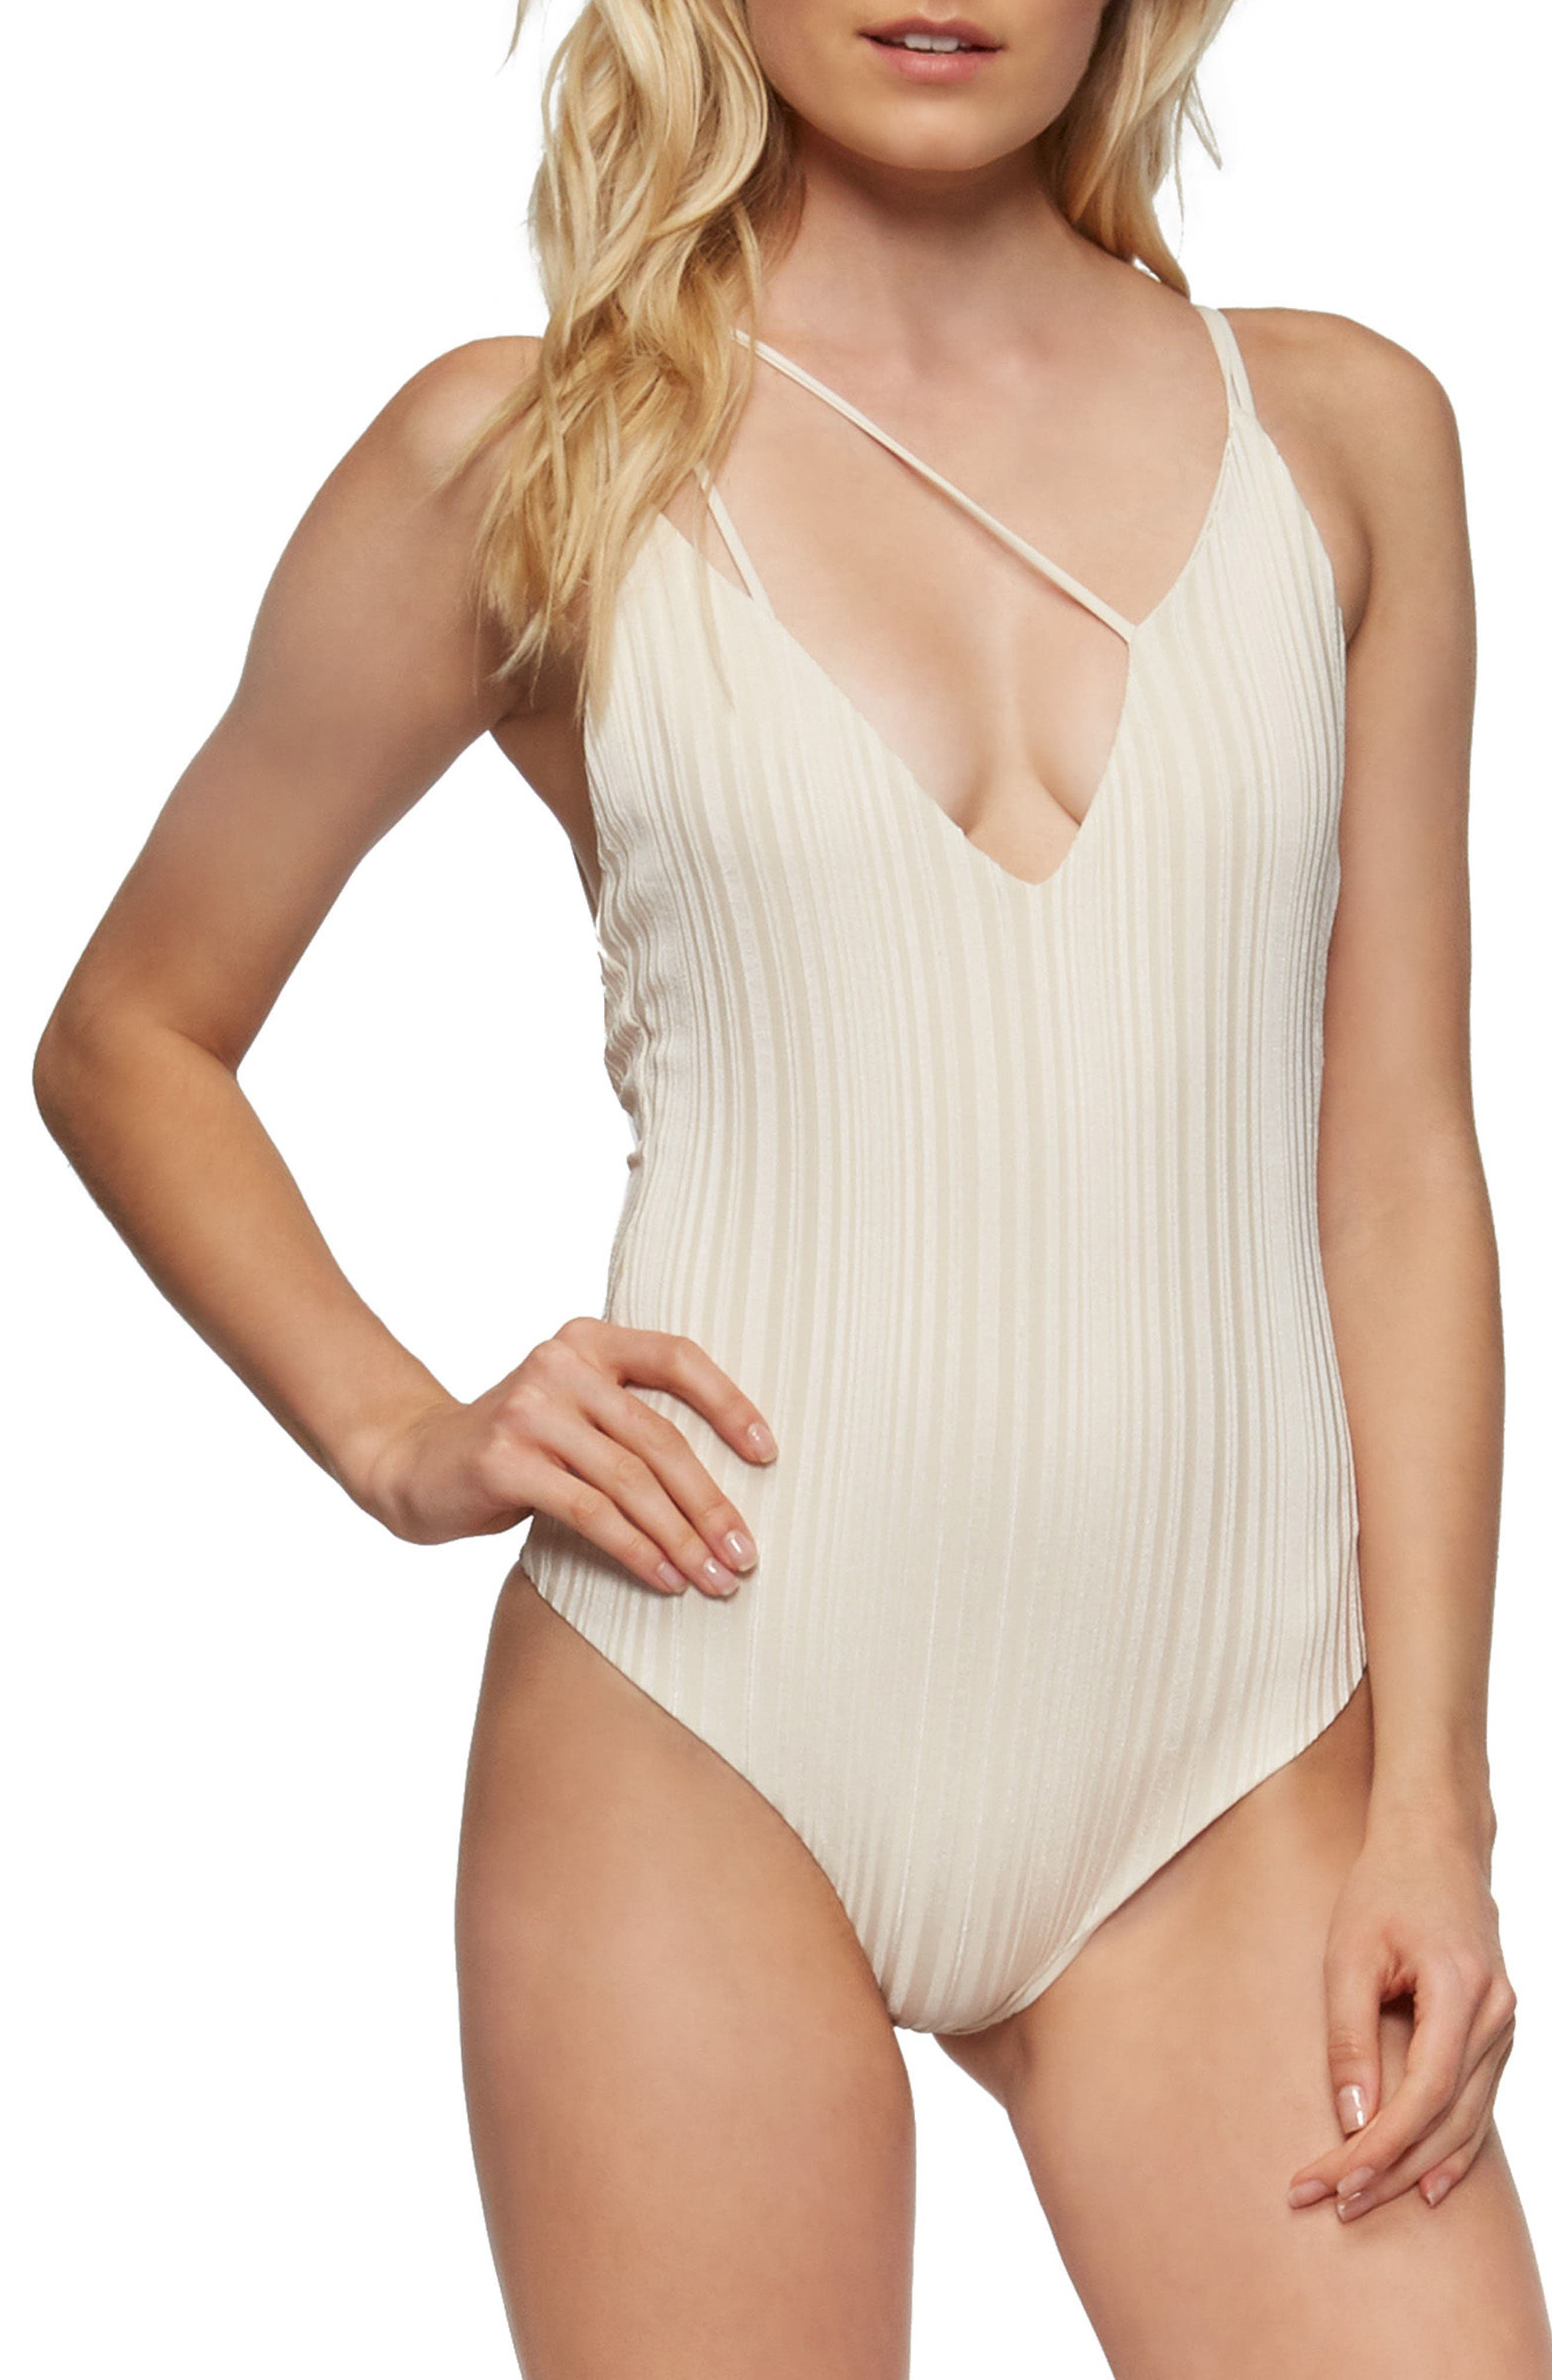 Coppola One-Piece Swimsuit,                         Main,                         color, 250